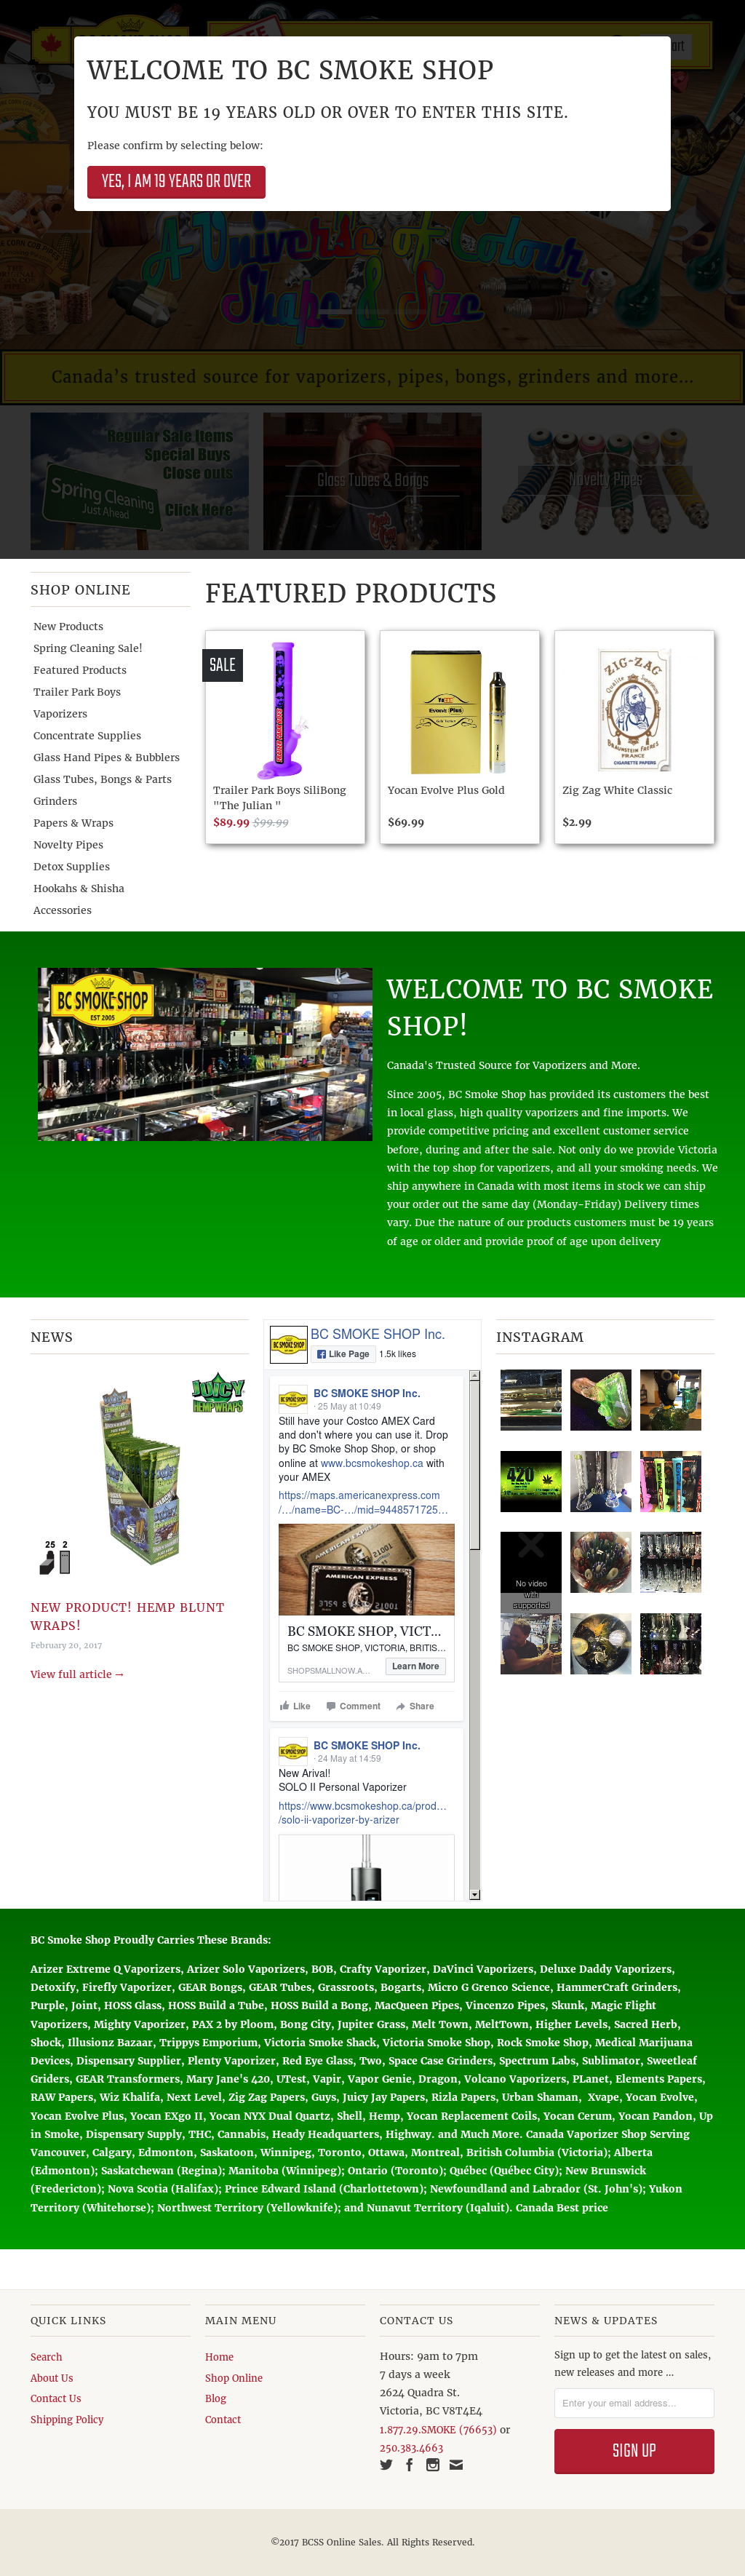 Bc Smoke Shop Competitors, Revenue and Employees - Owler Company Profile